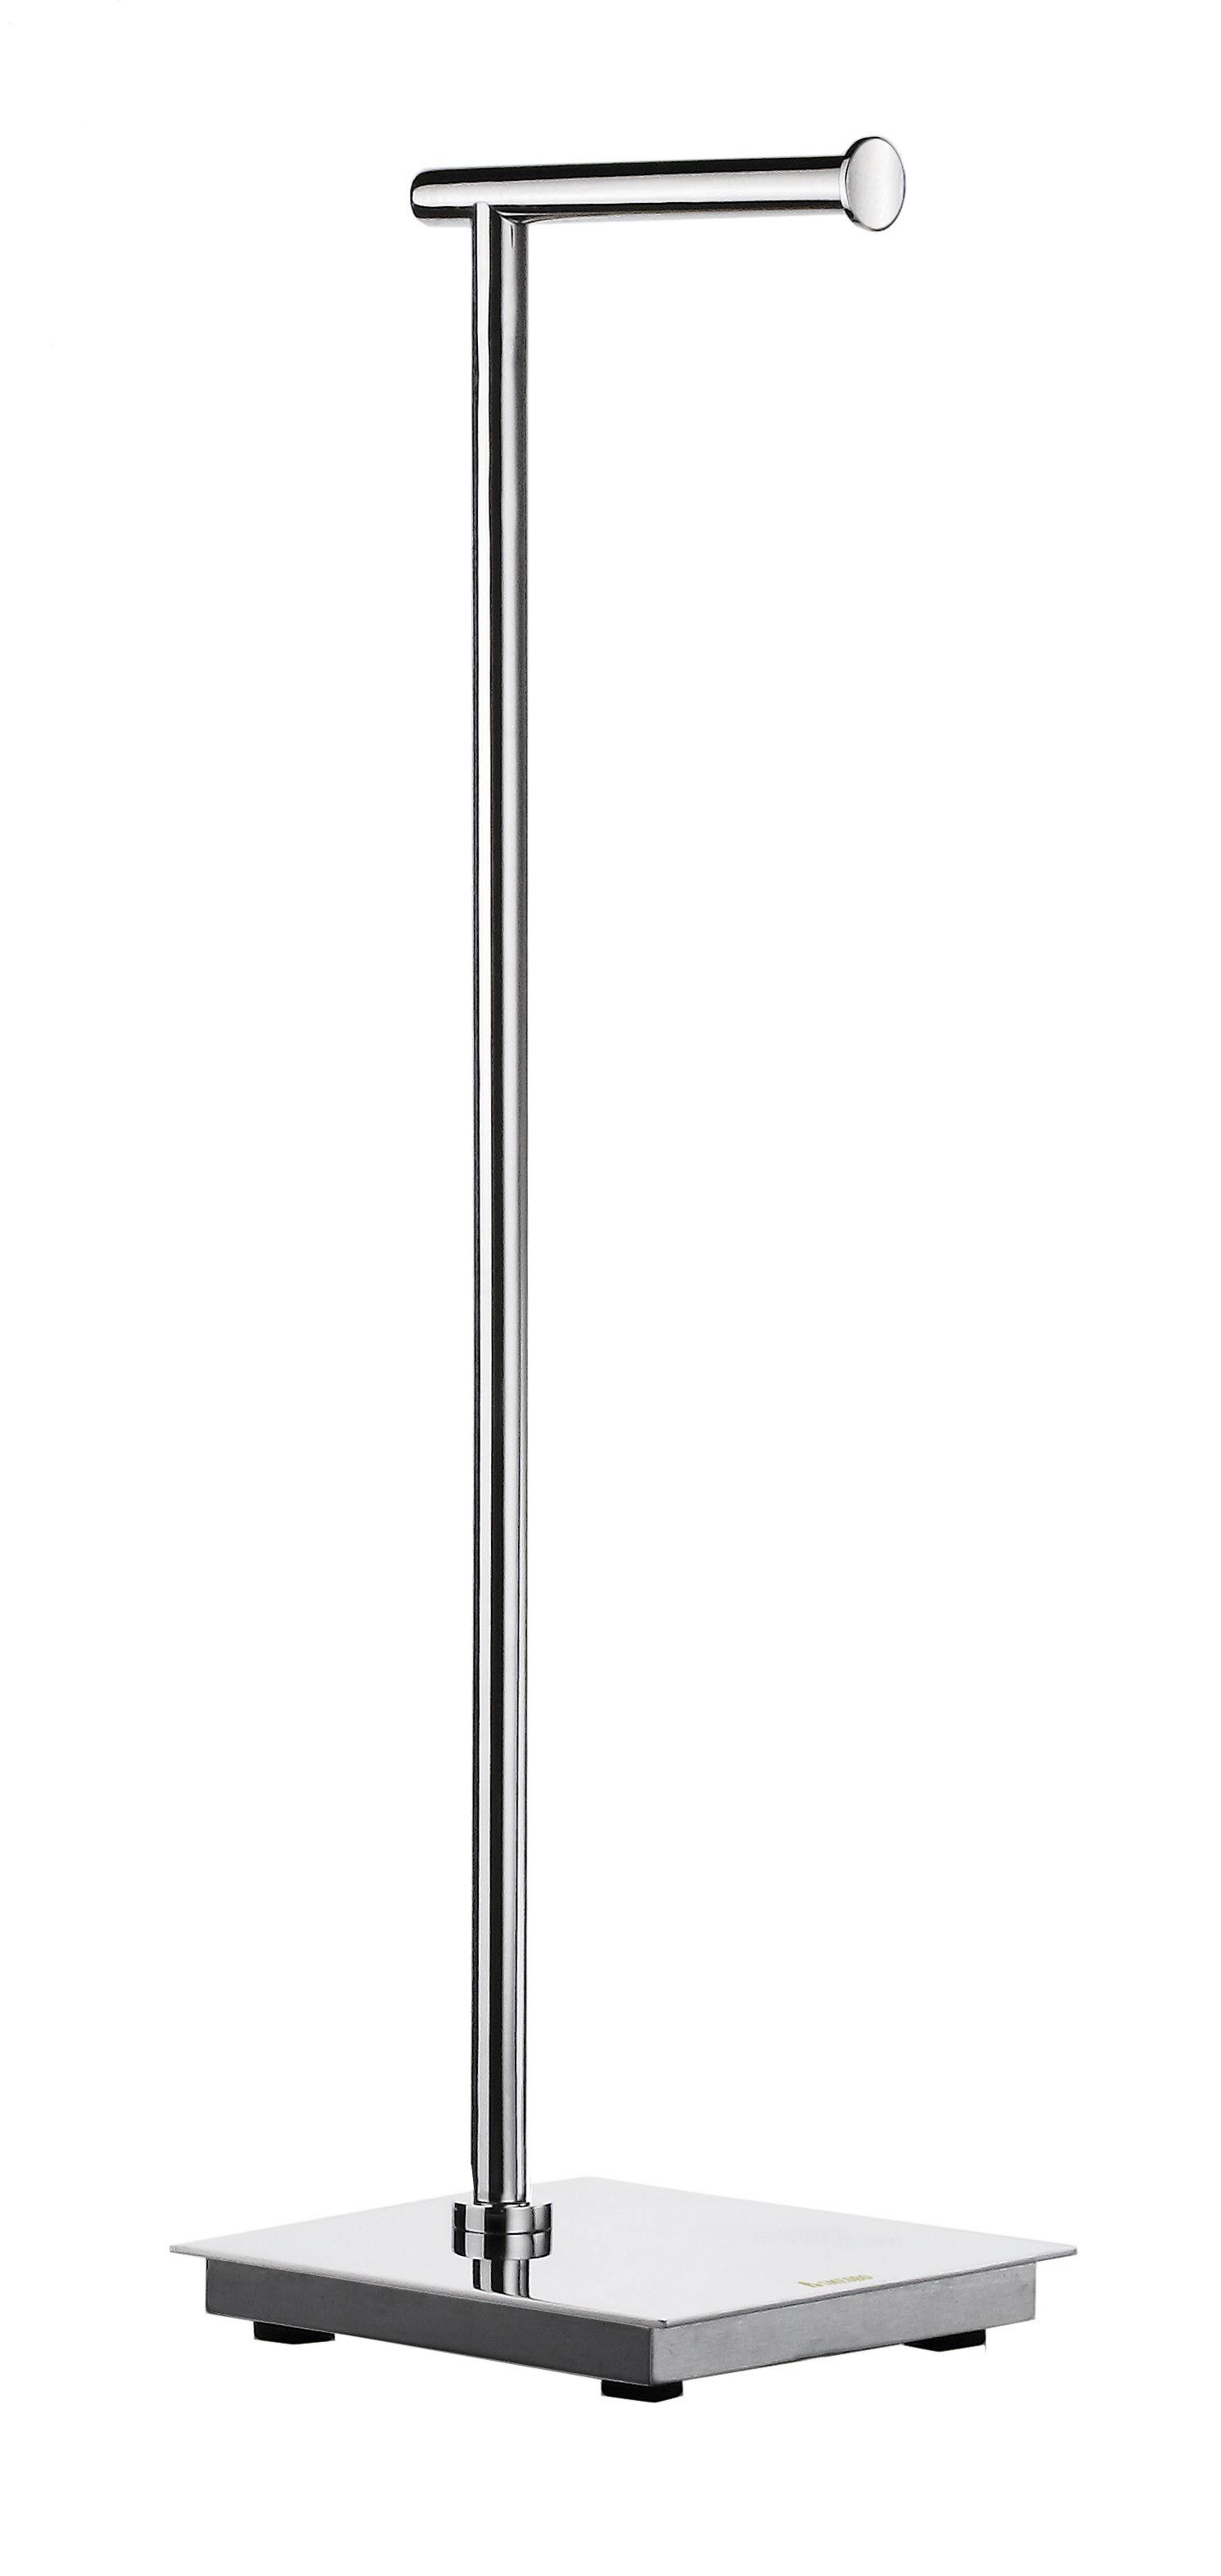 SMEDBO Outline Lite Toilettenpapierhalter, eckig